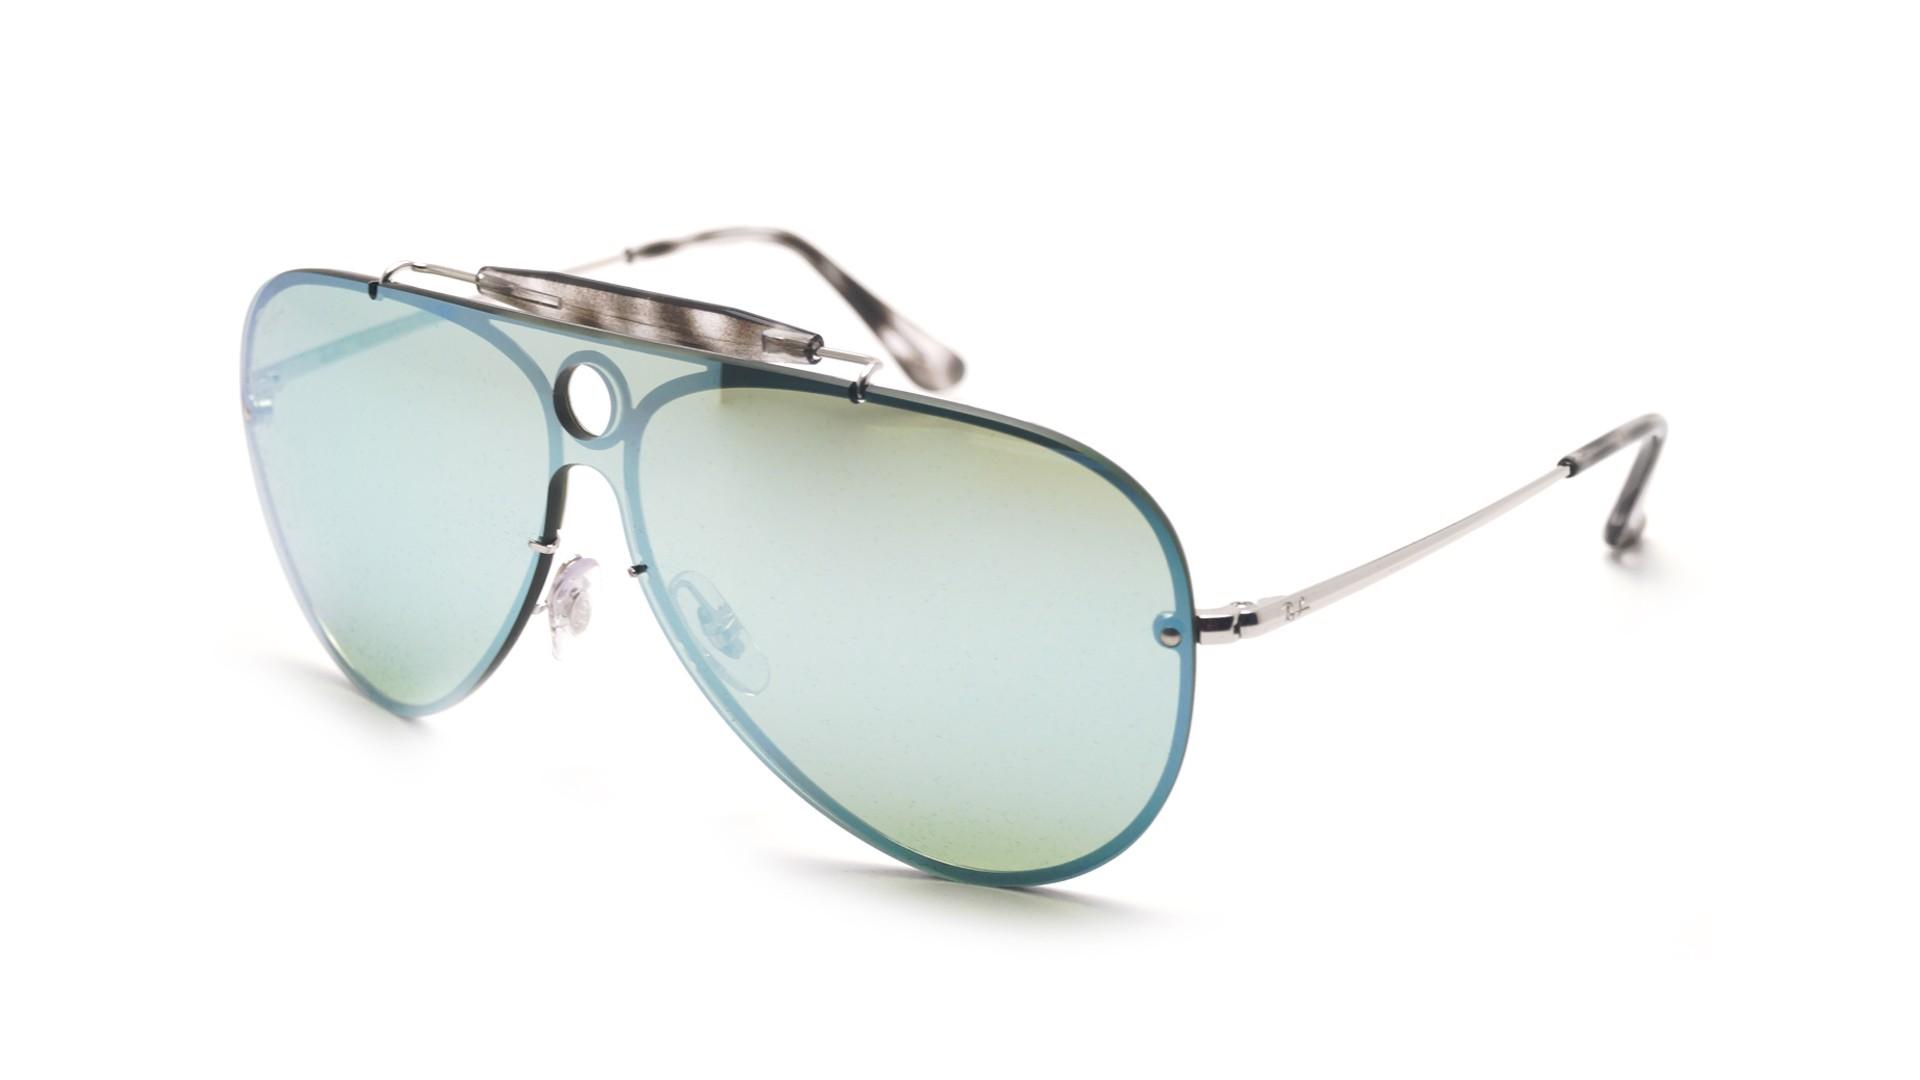 9b400c8c3e2b7 Sunglasses Ray-Ban Shooter Blaze Silver RB3581N 003 30 Large Mirror